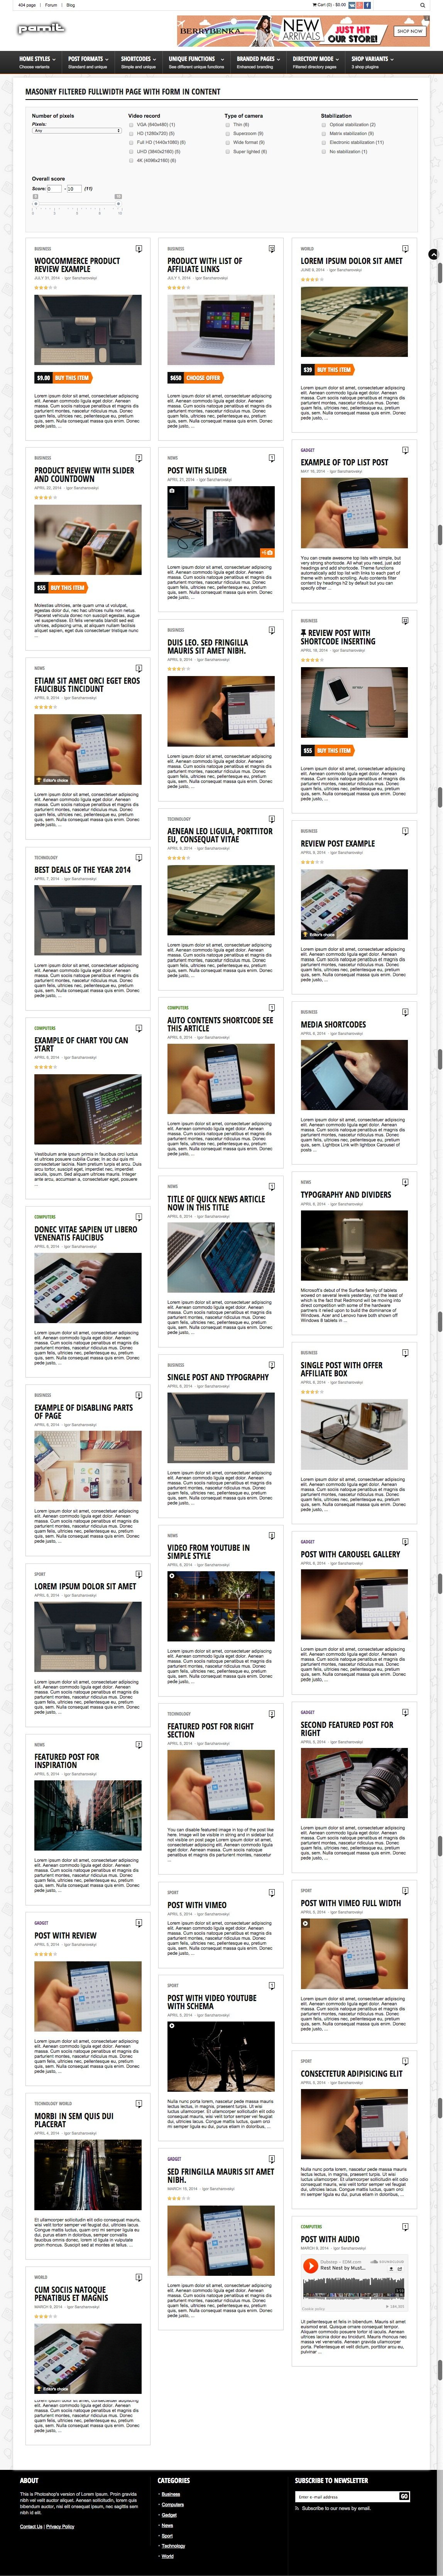 bikin website